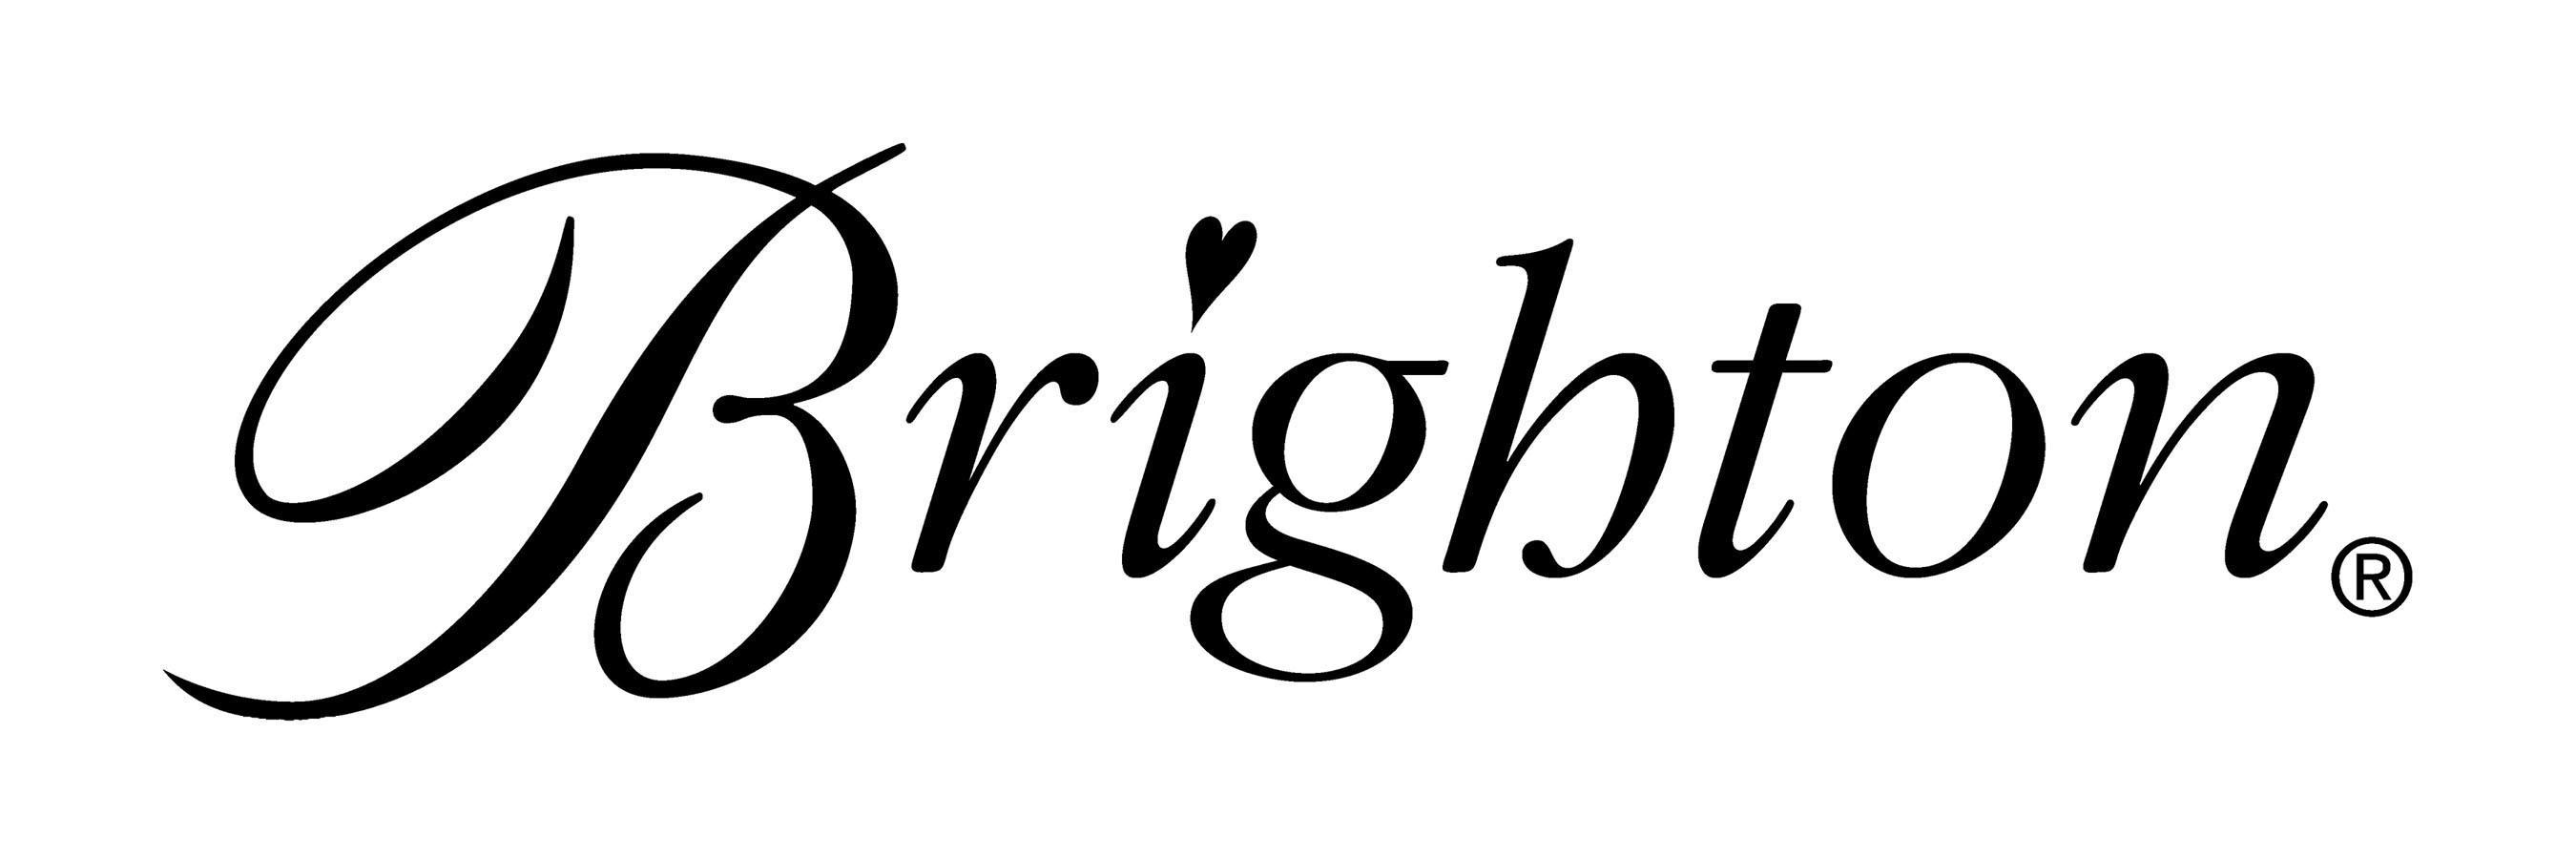 Brighton logo.